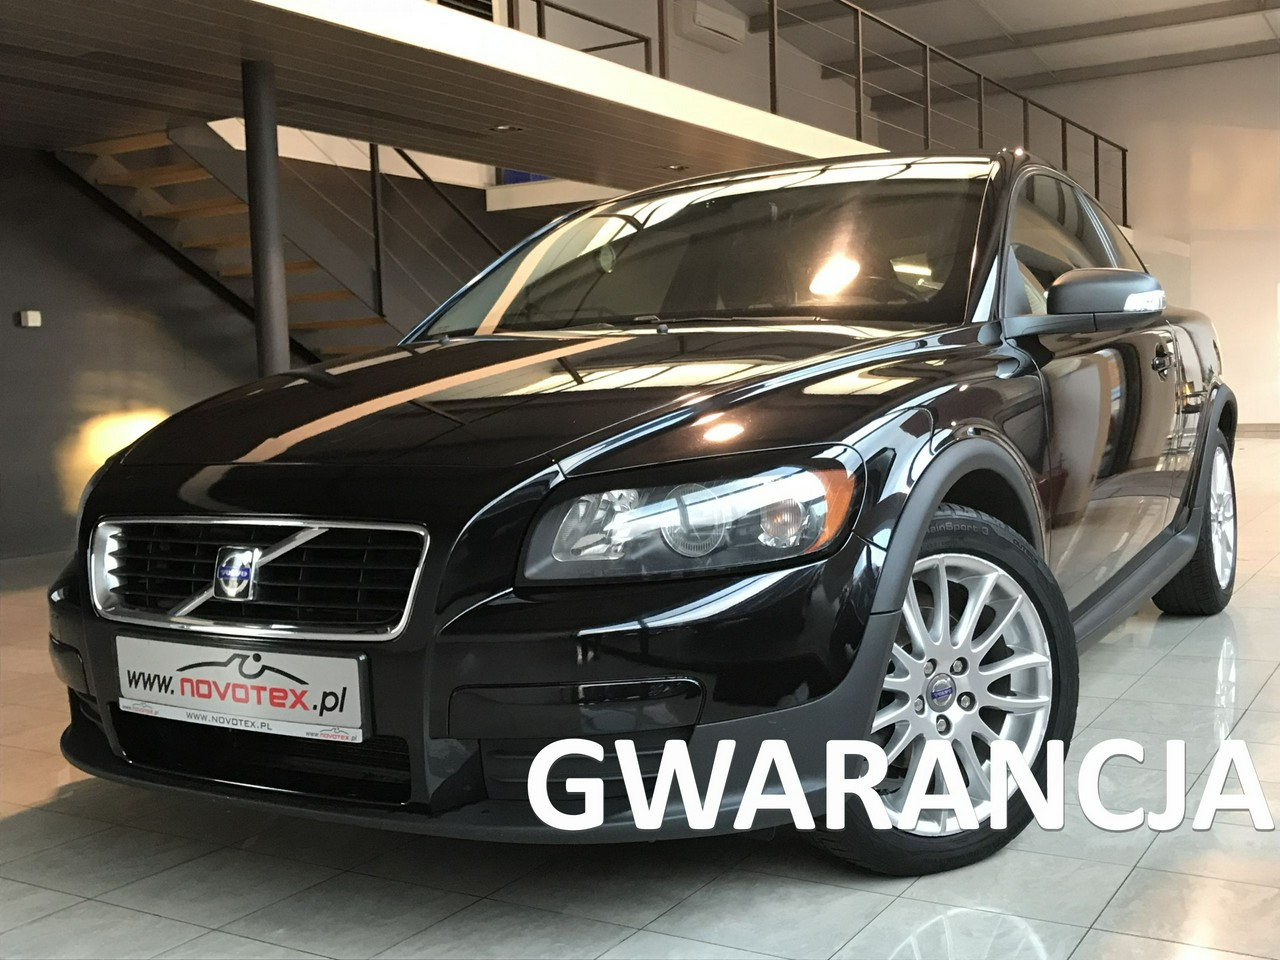 Volvo C30 1.6D*Momentum*pakiet Sport*alu 17*serwis ASO*Gwarancja VIP Service